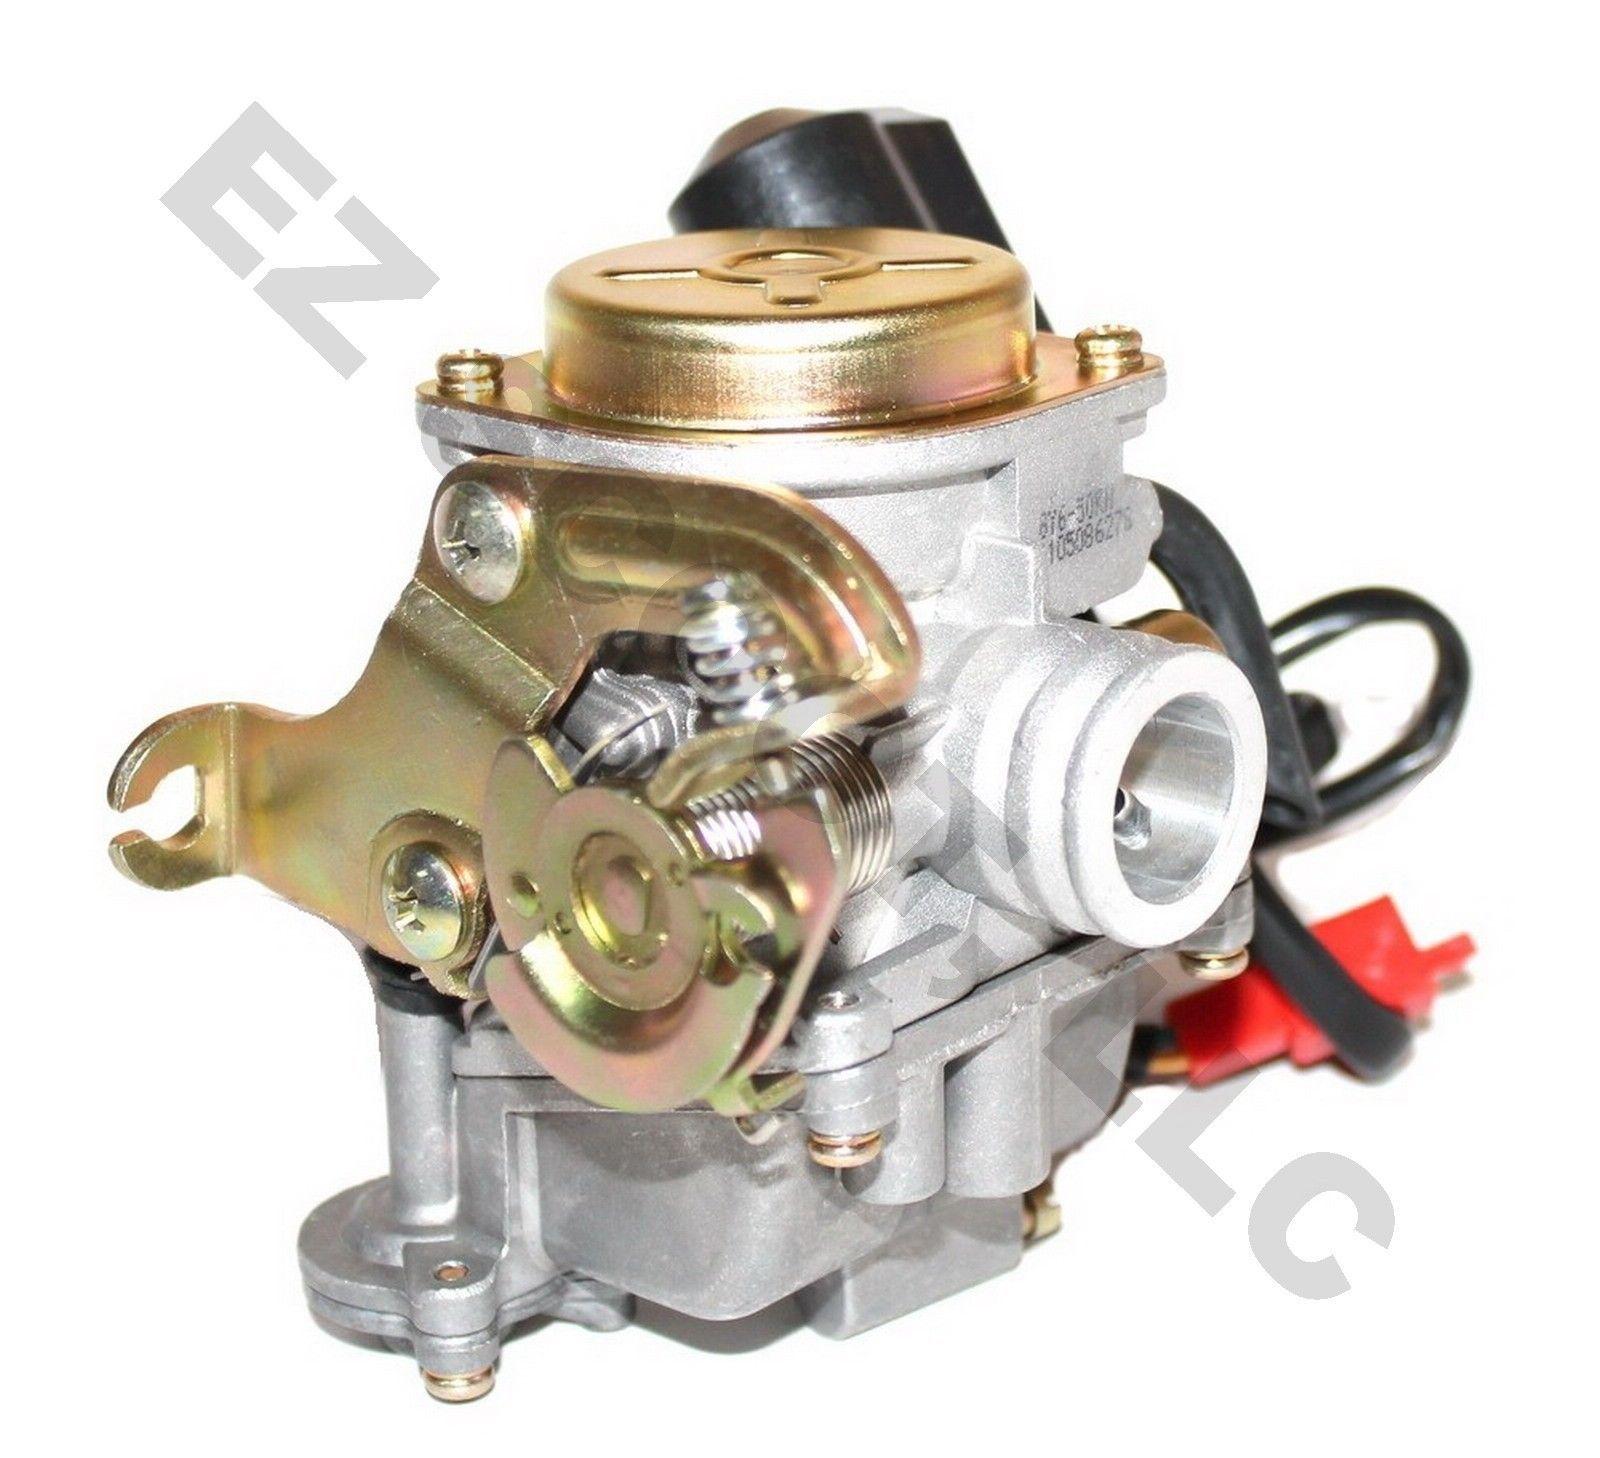 medium resolution of carburetor sport for 139 qmb 50 80cc 19mm gy6 chinese 4stroke scooter atv taotao ebay